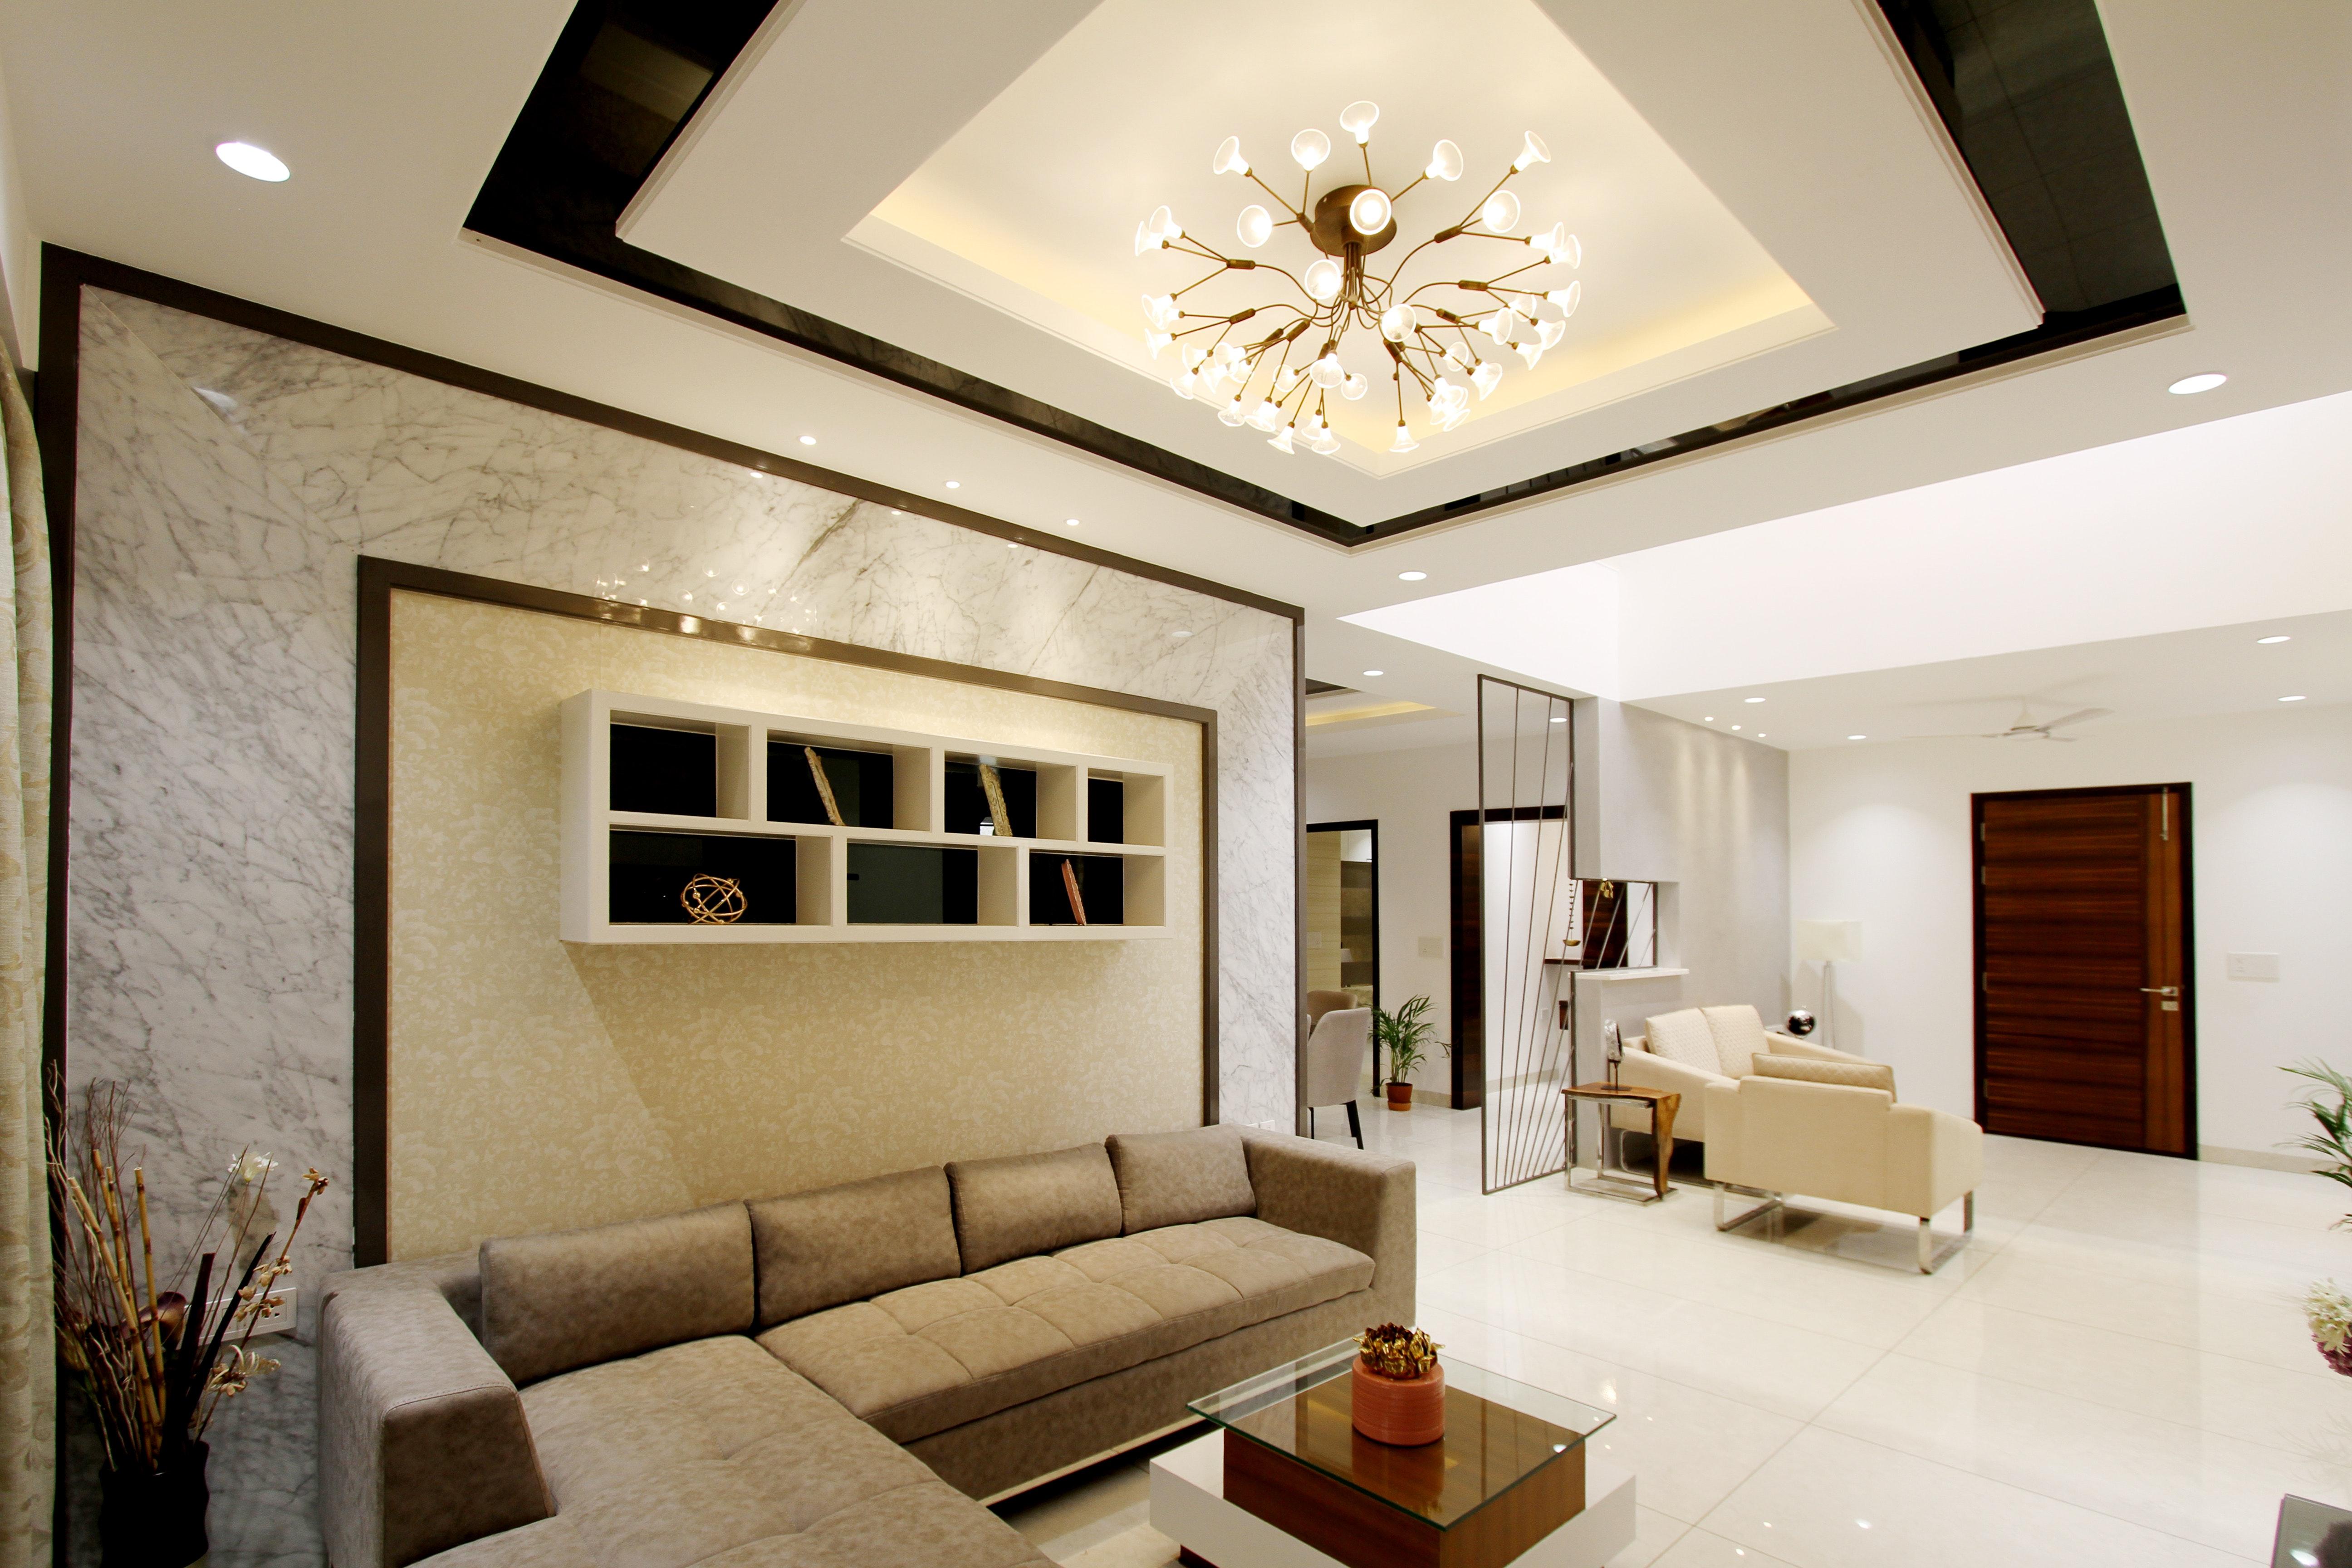 Interior Design Of A Living Room · Free Stock Photo